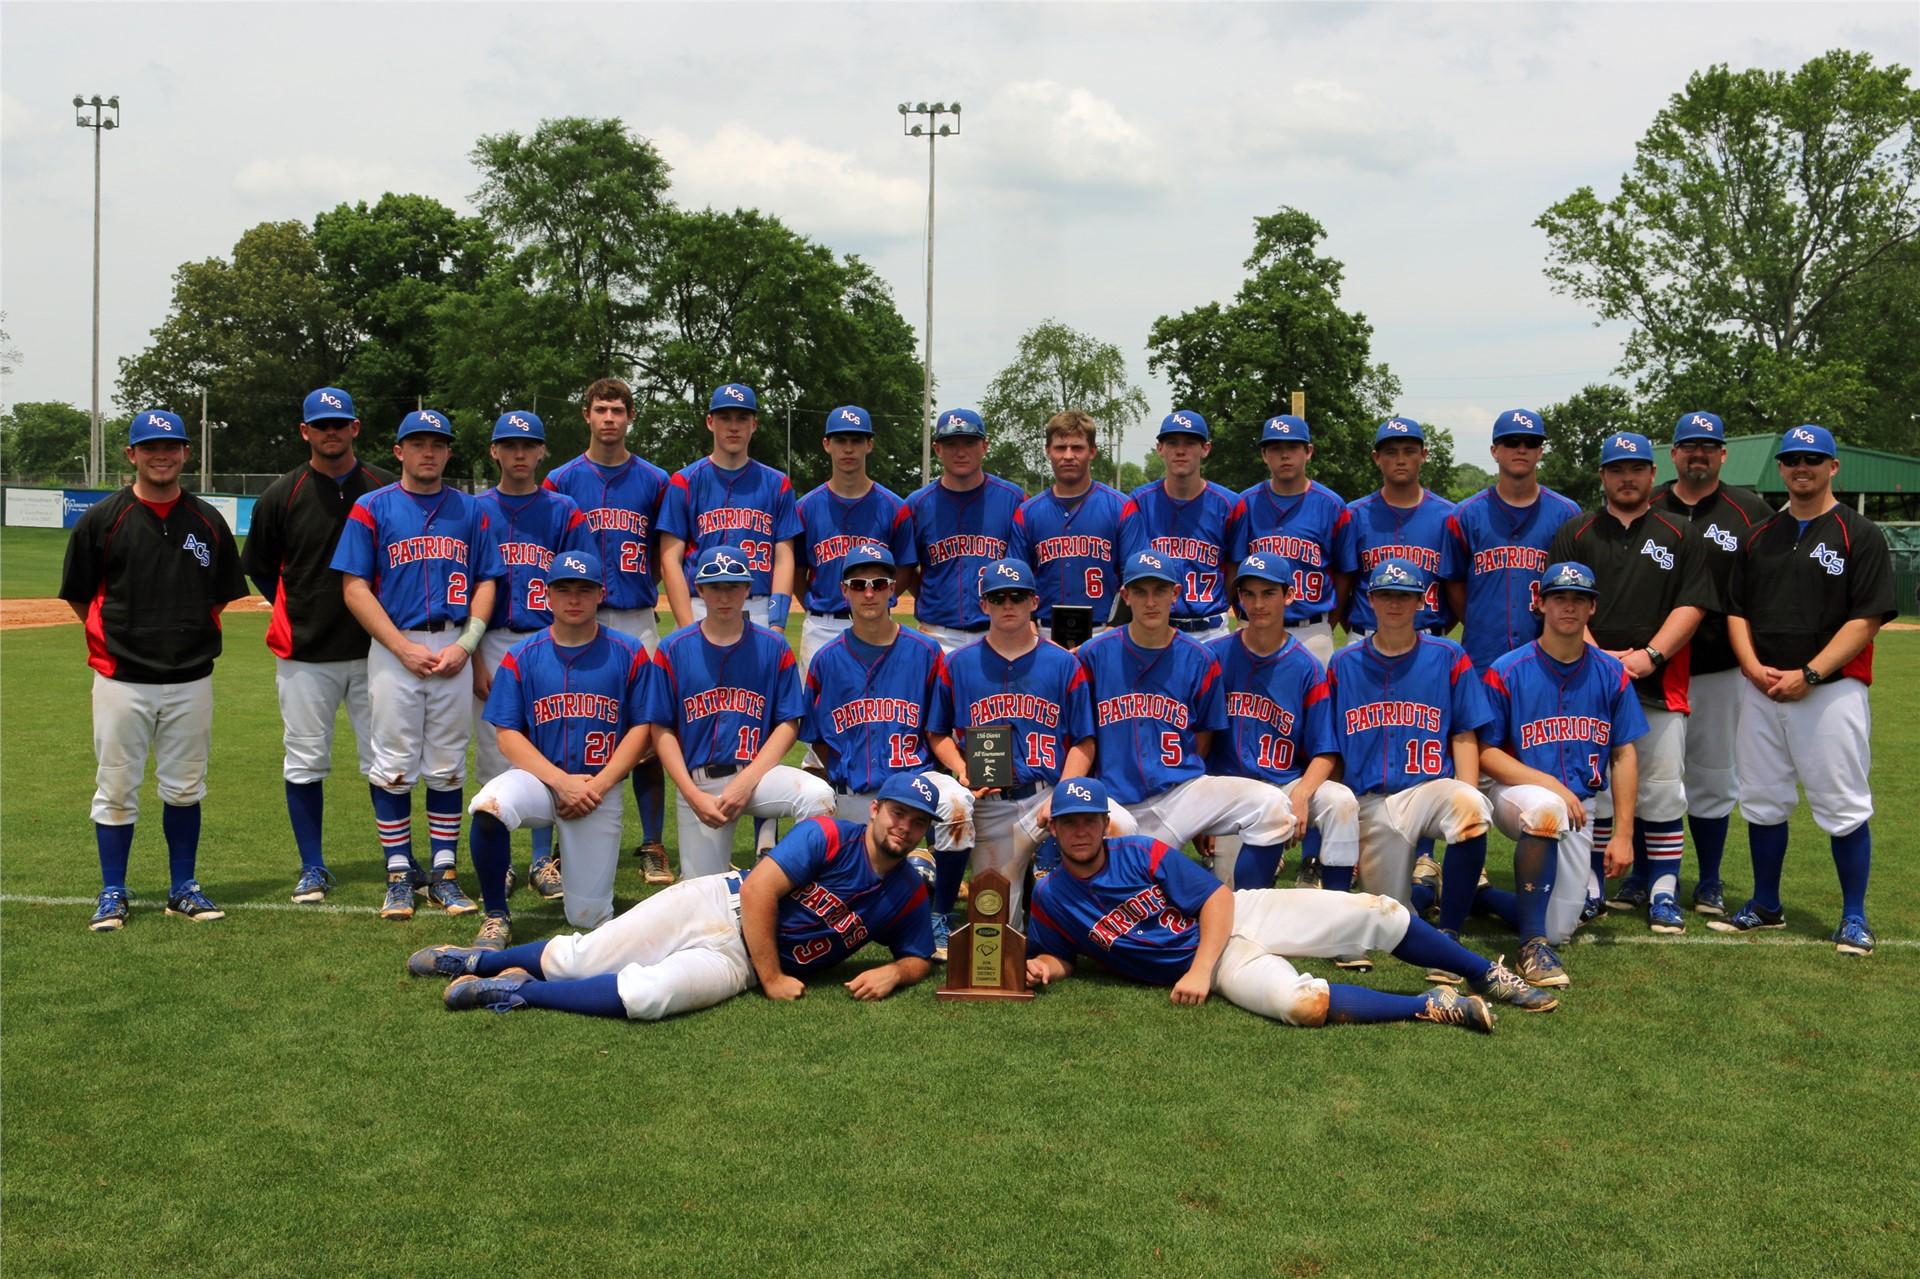 2016 District Champions